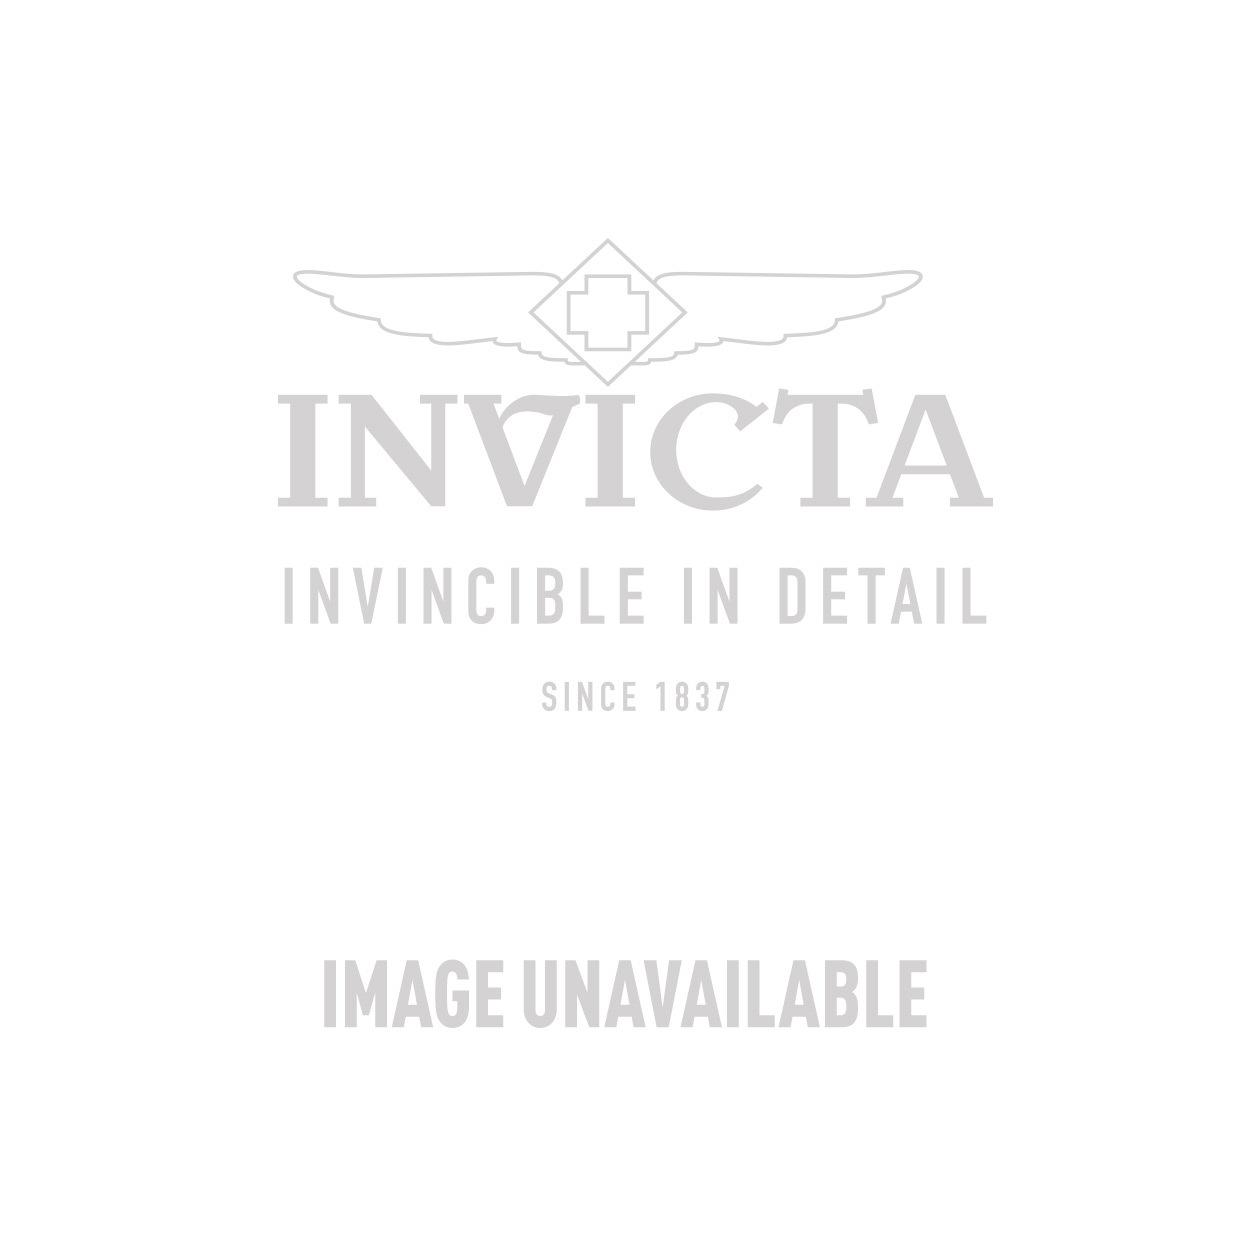 Invicta Aviator Swiss Movement Quartz Watch - Stainless Steel case with Black tone Polyurethane band - Model 1746